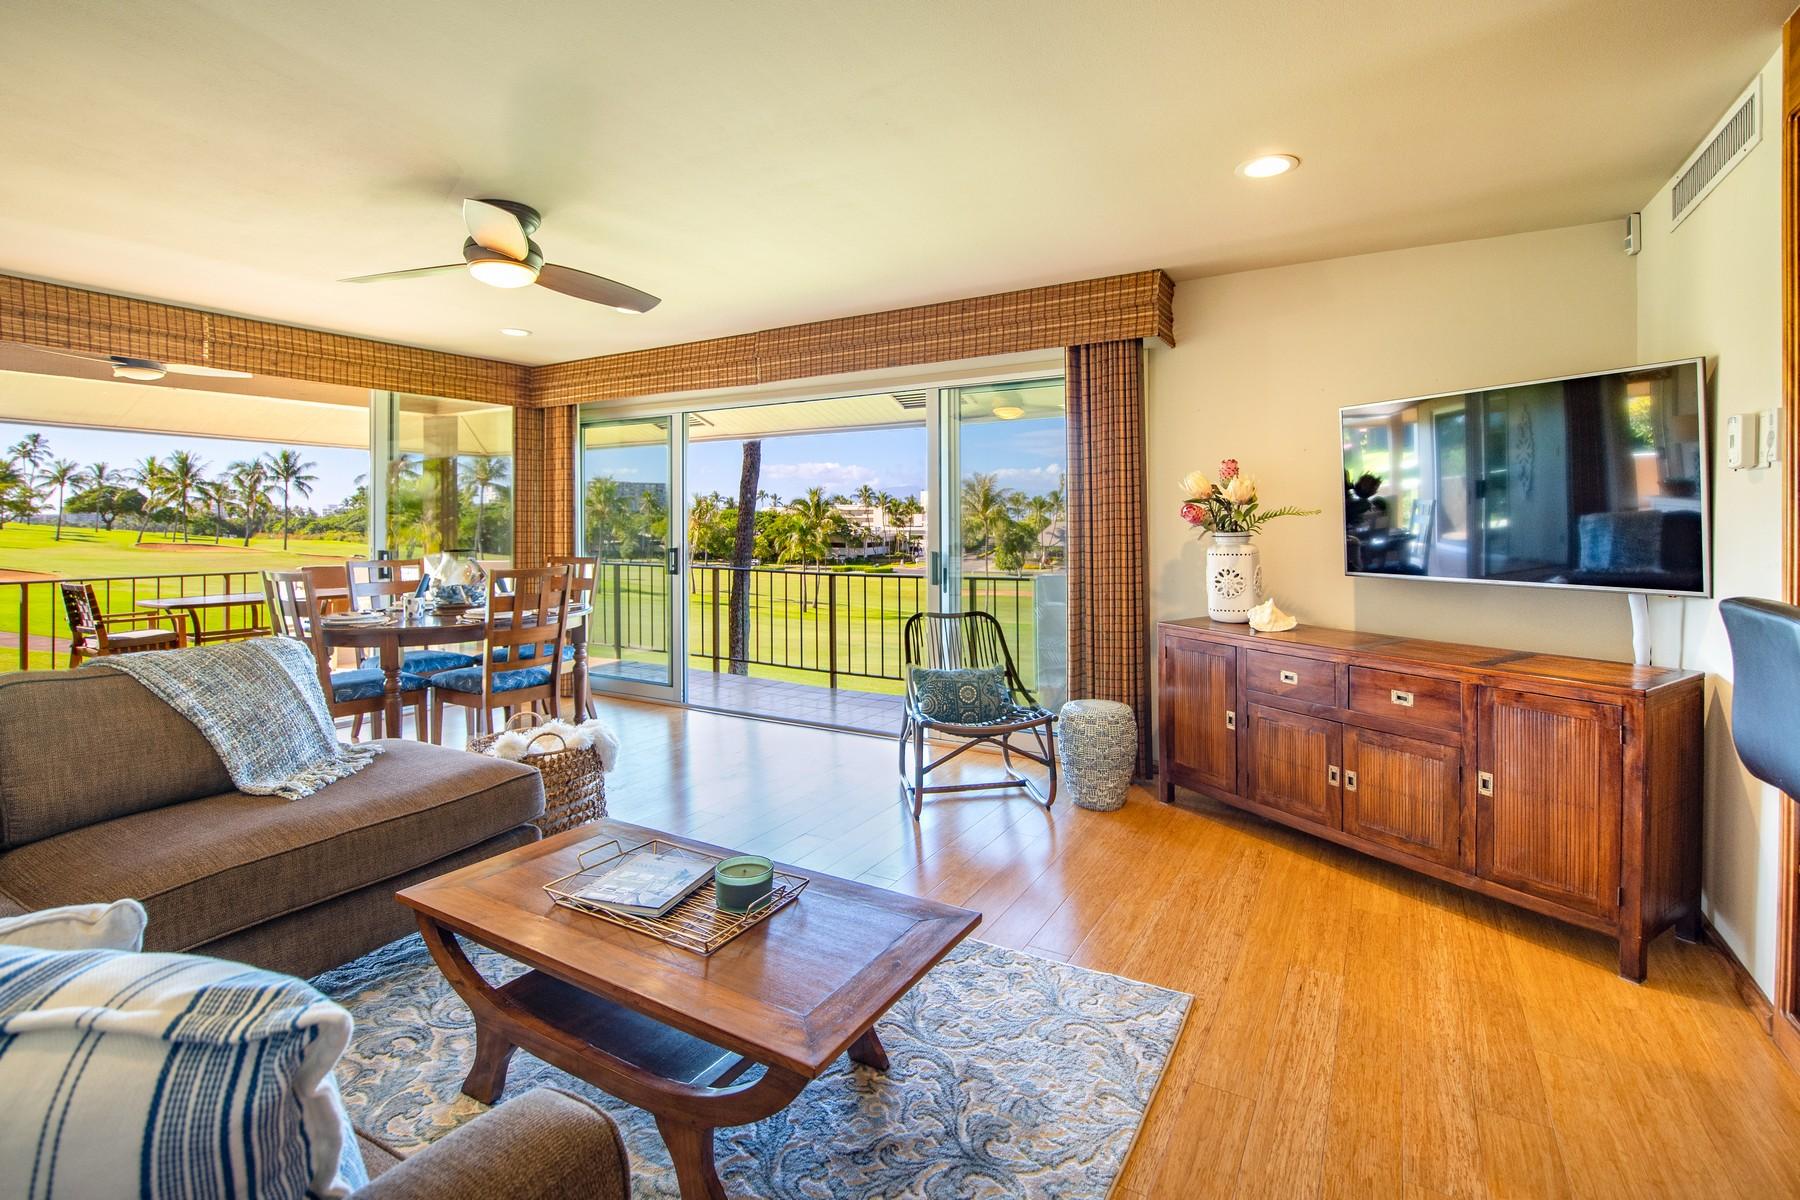 Condominiums for Sale at Live on the Golf Course in Kaanapali 2661 Kekaa Dr, Maui Eldorado #G206-207 Lahaina, Hawaii 96761 United States